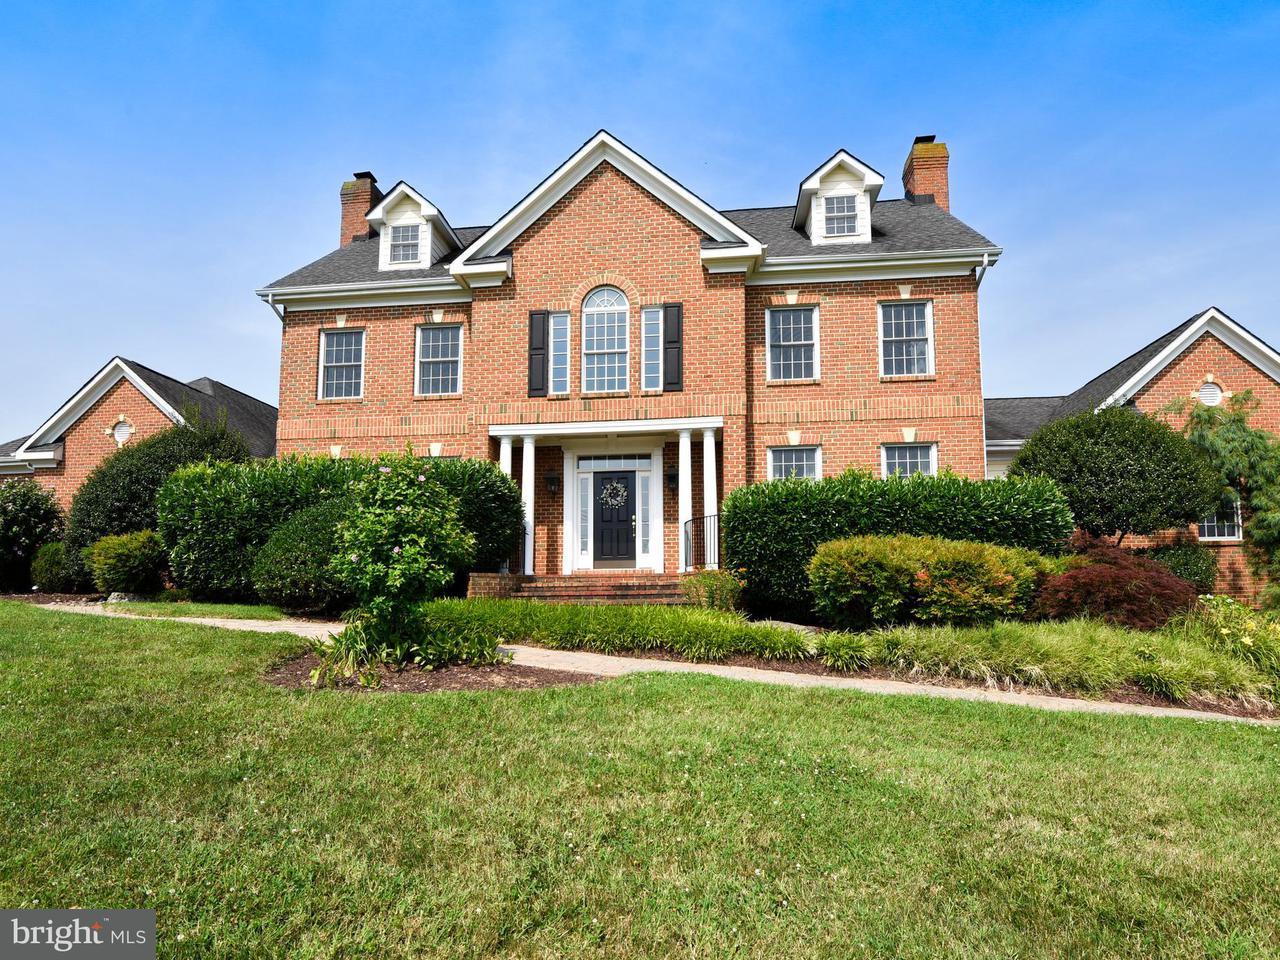 Casa Unifamiliar por un Venta en 1100 THOMAS SWANN Lane 1100 THOMAS SWANN Lane Davidsonville, Maryland 21035 Estados Unidos